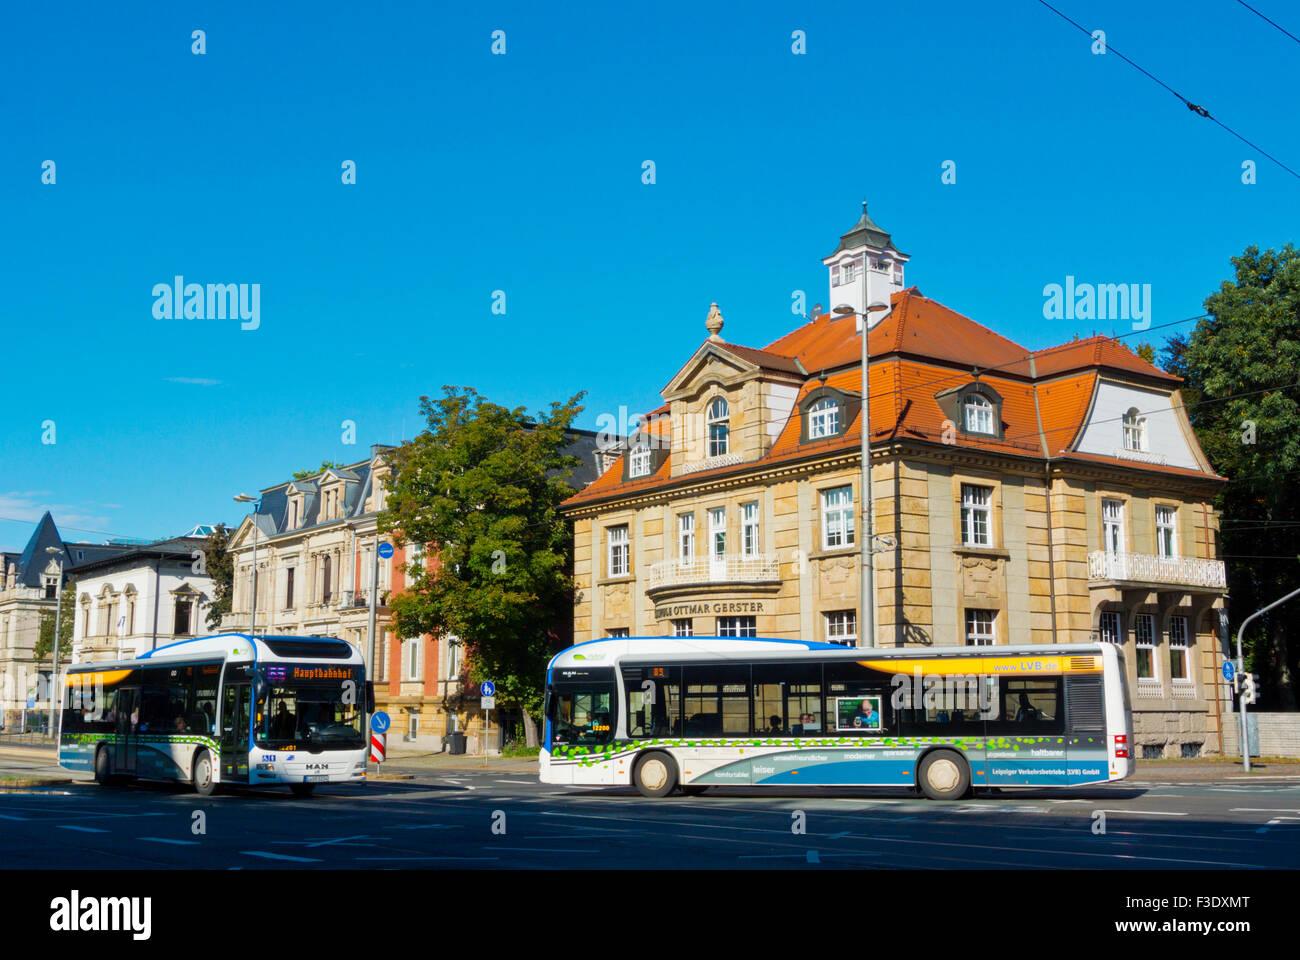 Los autobuses de transporte público, Karli, Karl-Tauchnitz-Strasse, Leipzig, Sajonia, Alemania Imagen De Stock